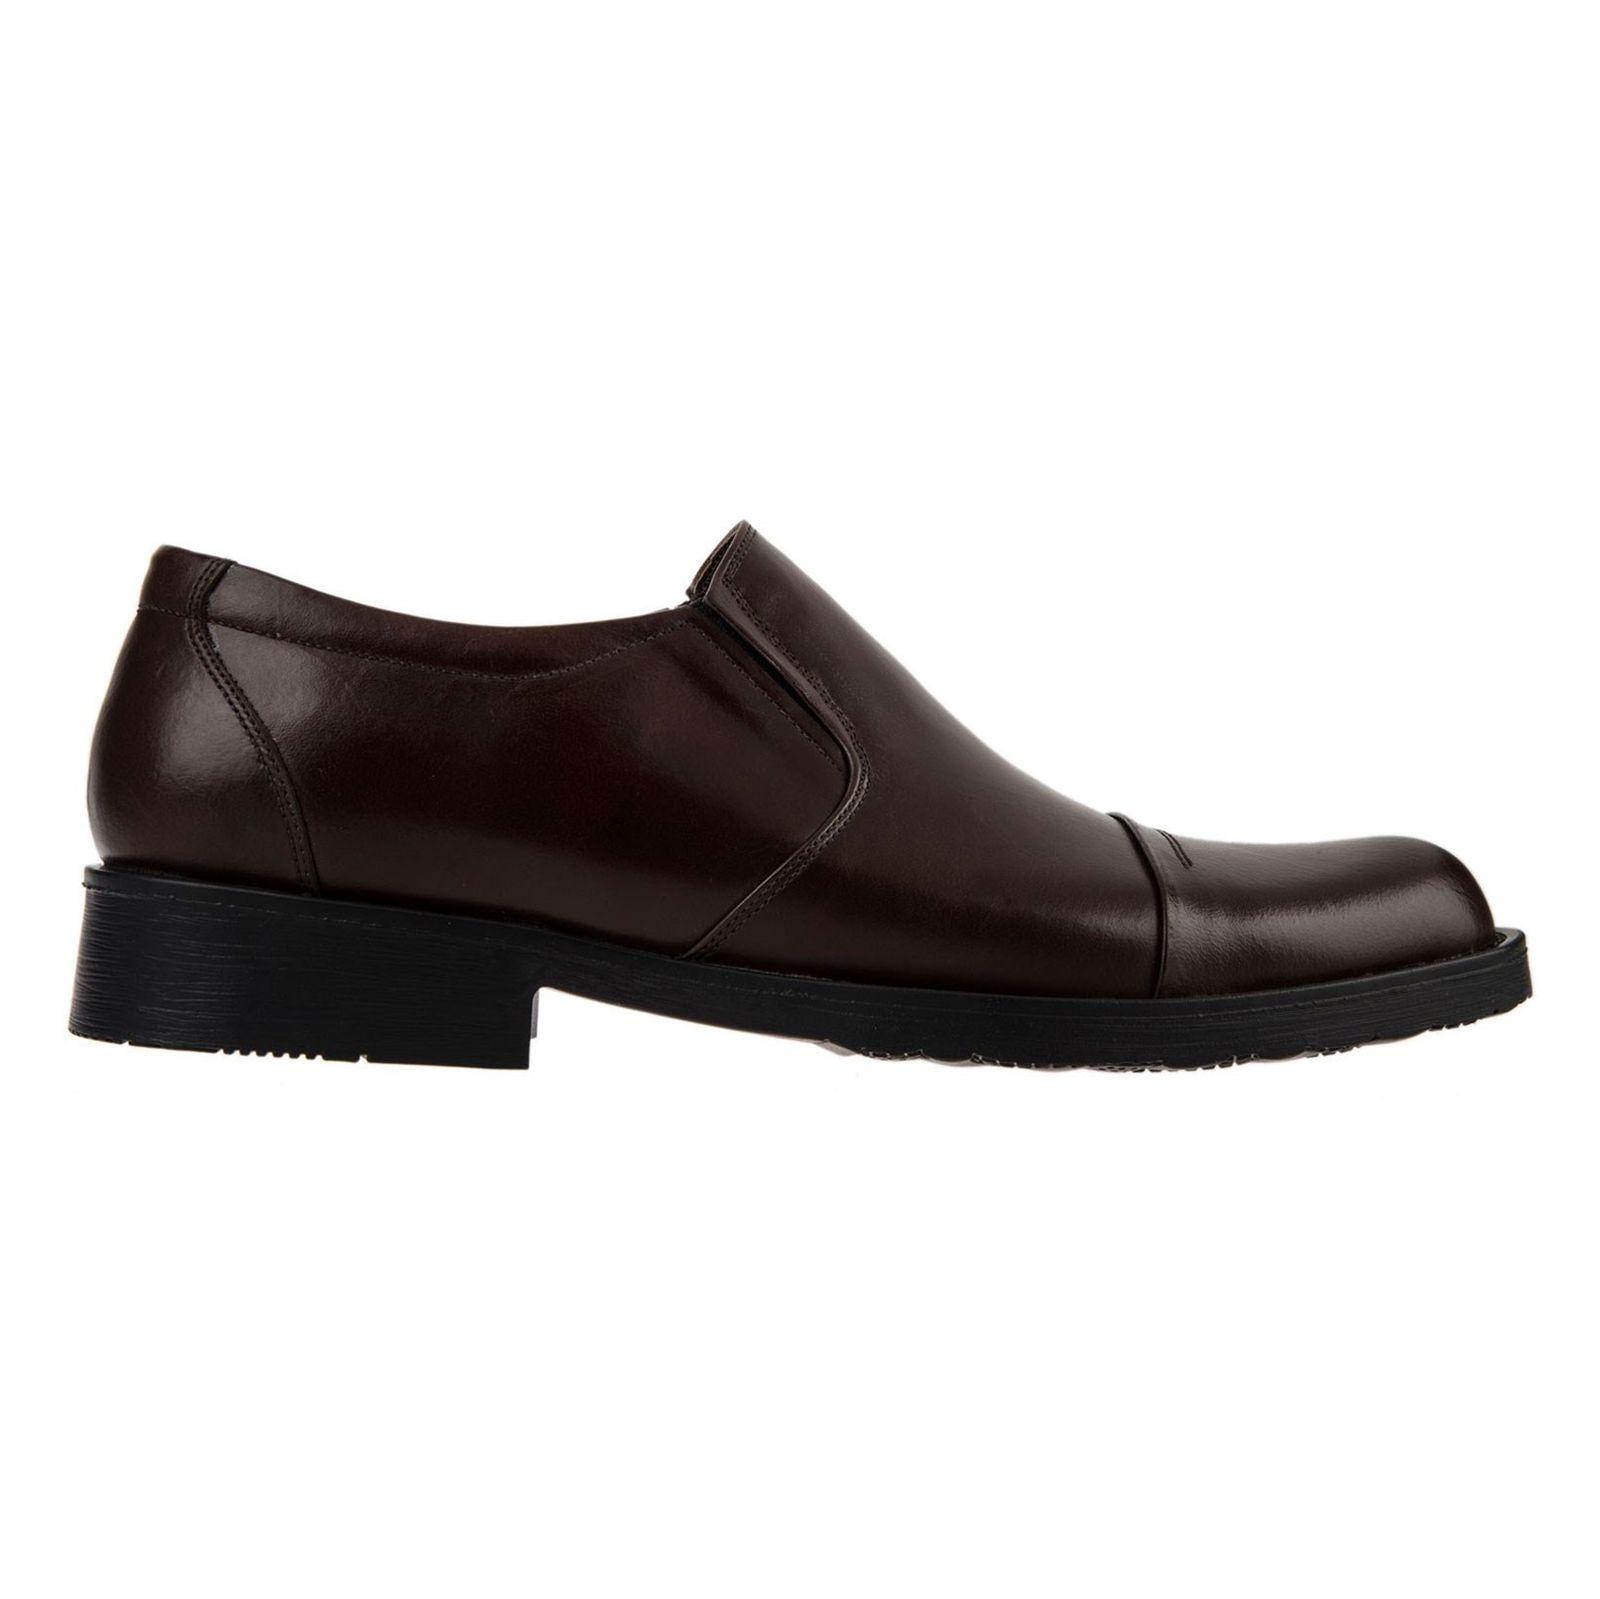 کفش اداری چرم مردانه - پانیسا - قهوه اي  - 1